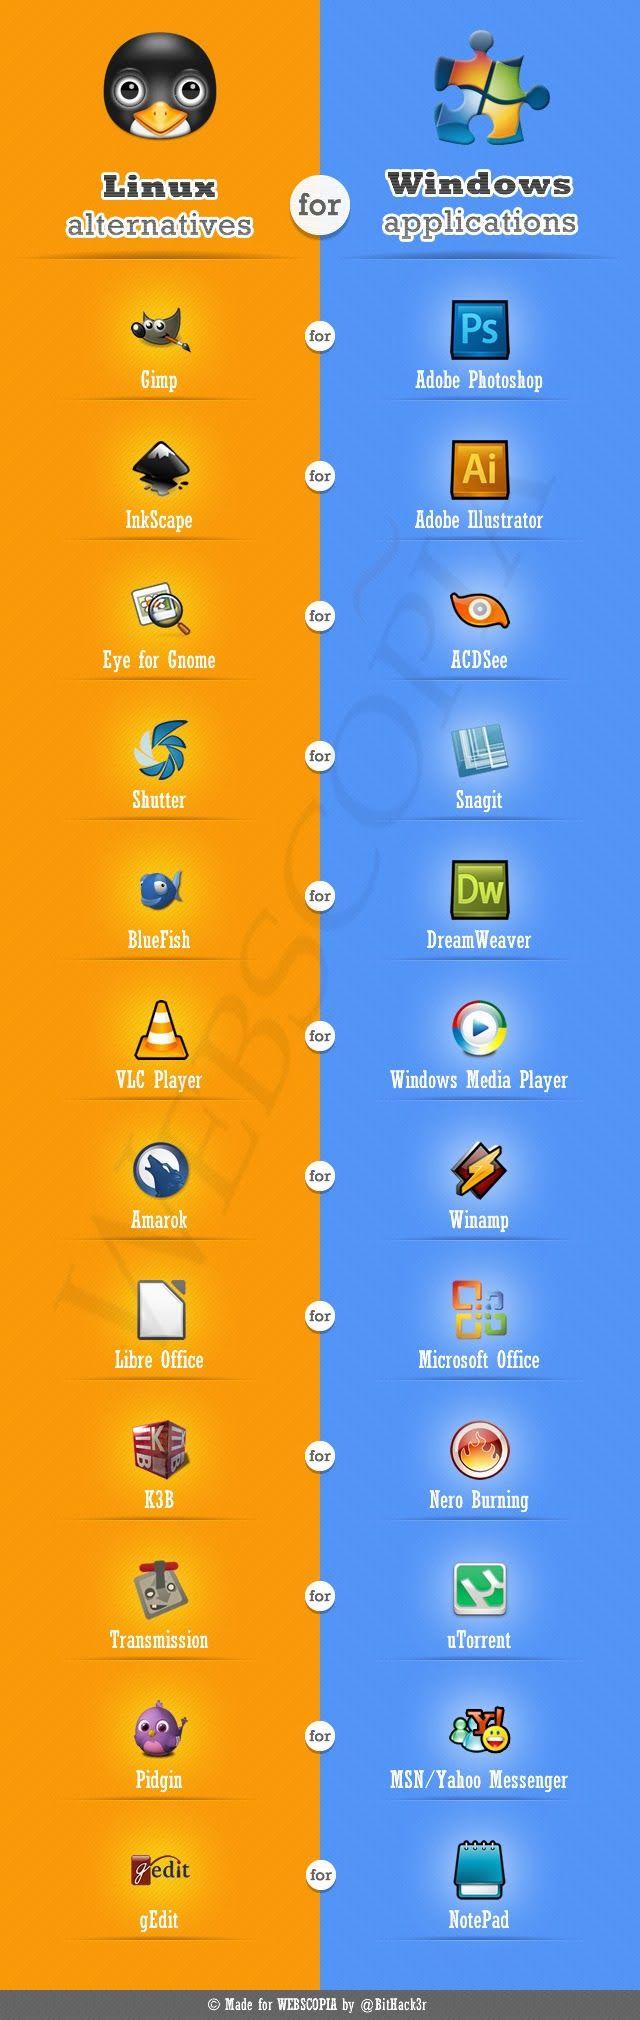 Windows Apps Vs Linux Alternatives Technology Unturned Sistema